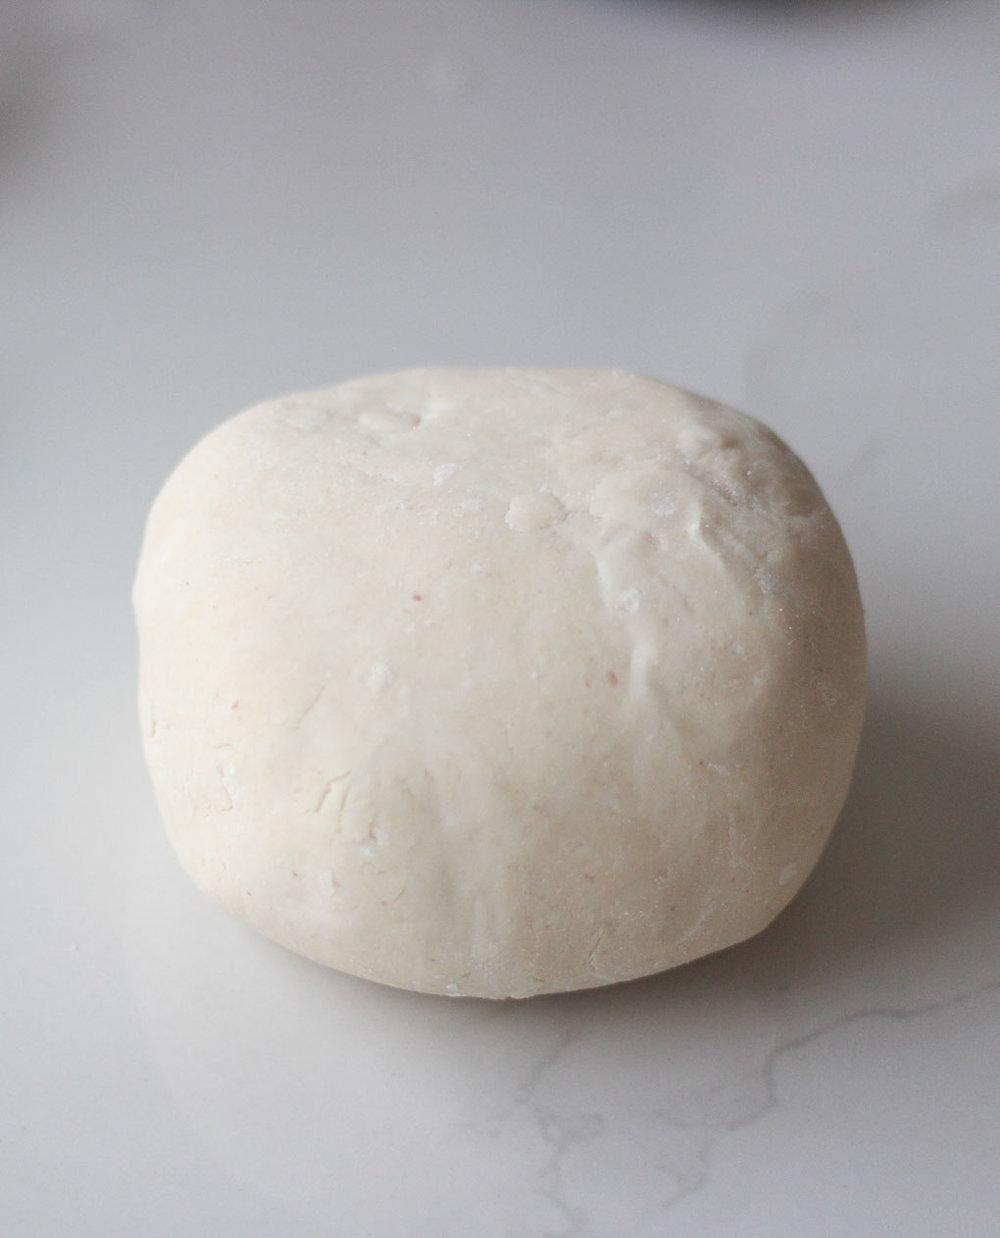 Paleo_low_FODMAP_gluten_free_flatbread_pizza (1 of 5).JPG